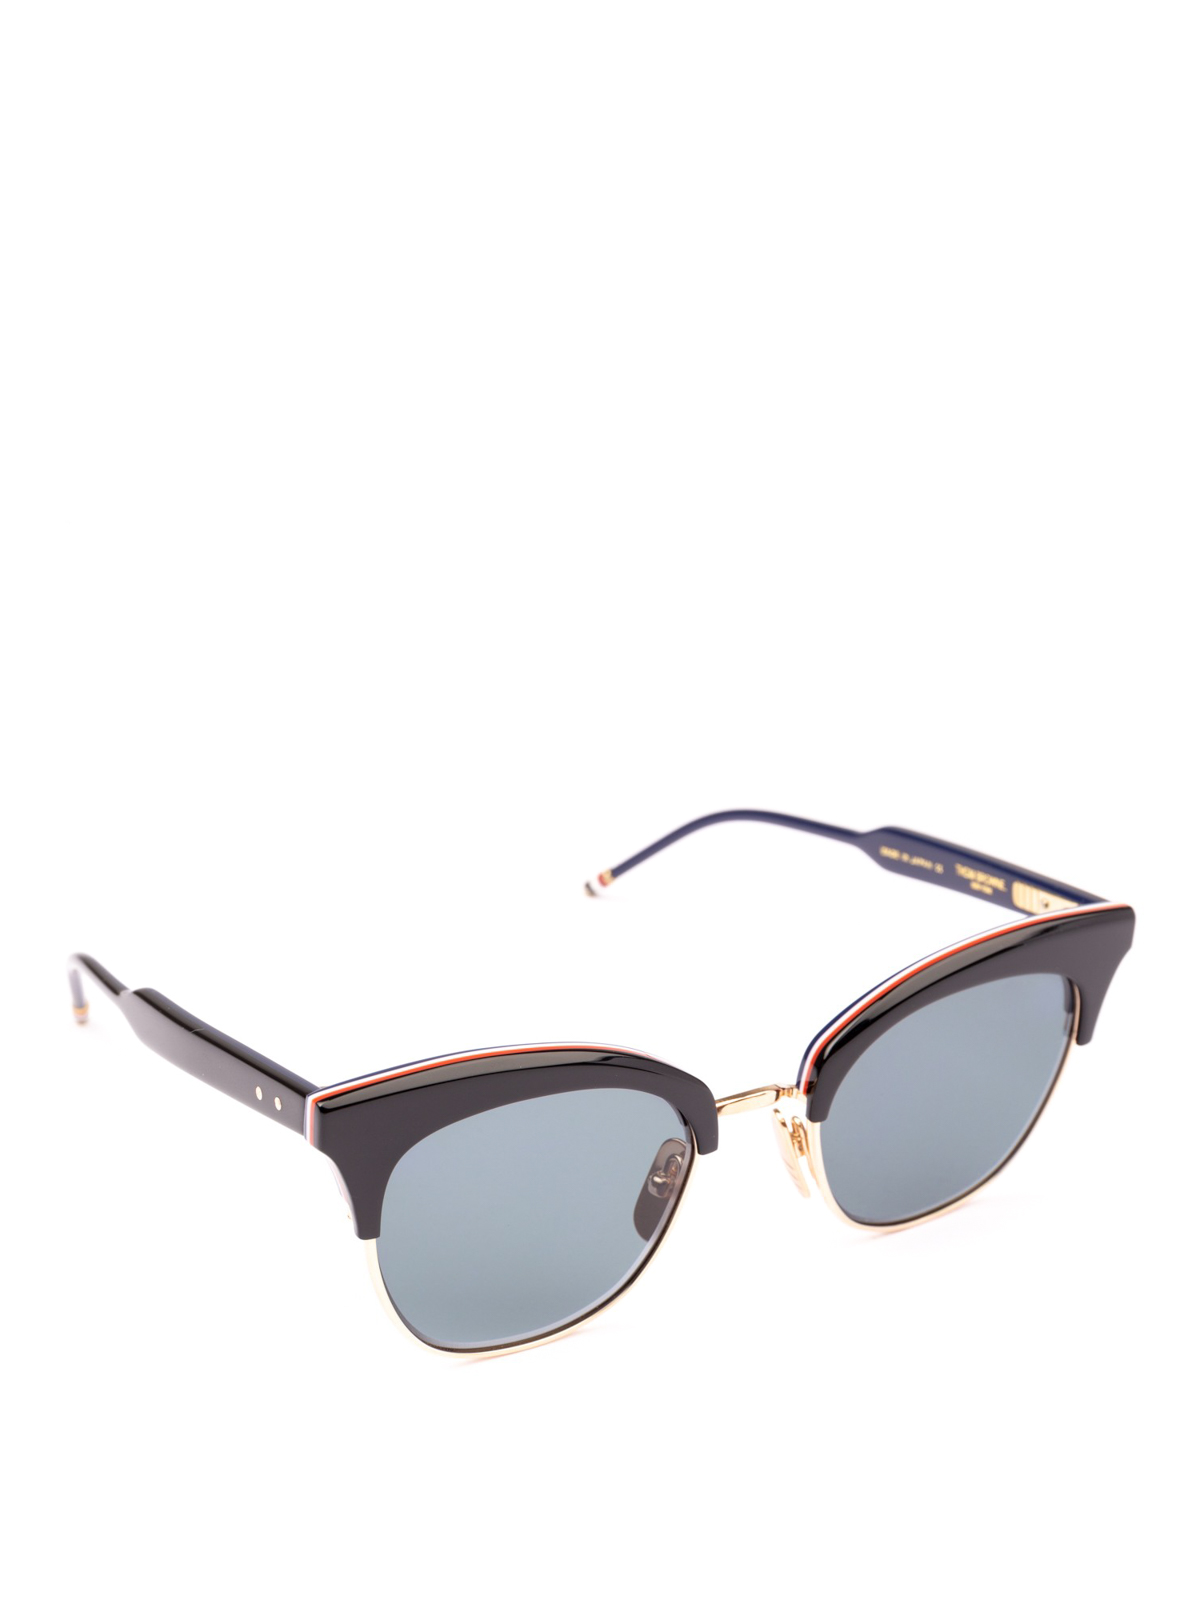 8c250d04c1d Thom Browne - 12K gold laminated lens rim sunglasses - sunglasses ...